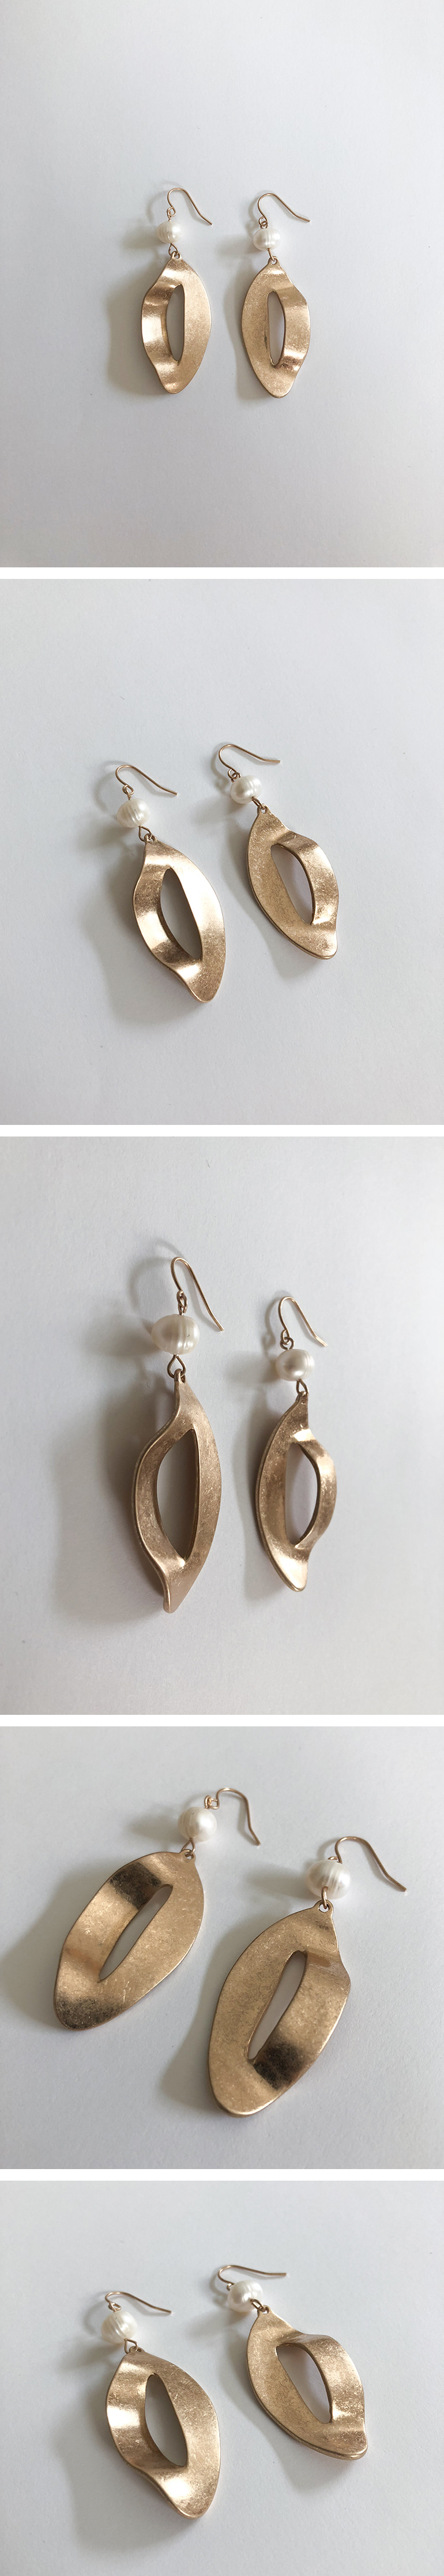 matisse earring